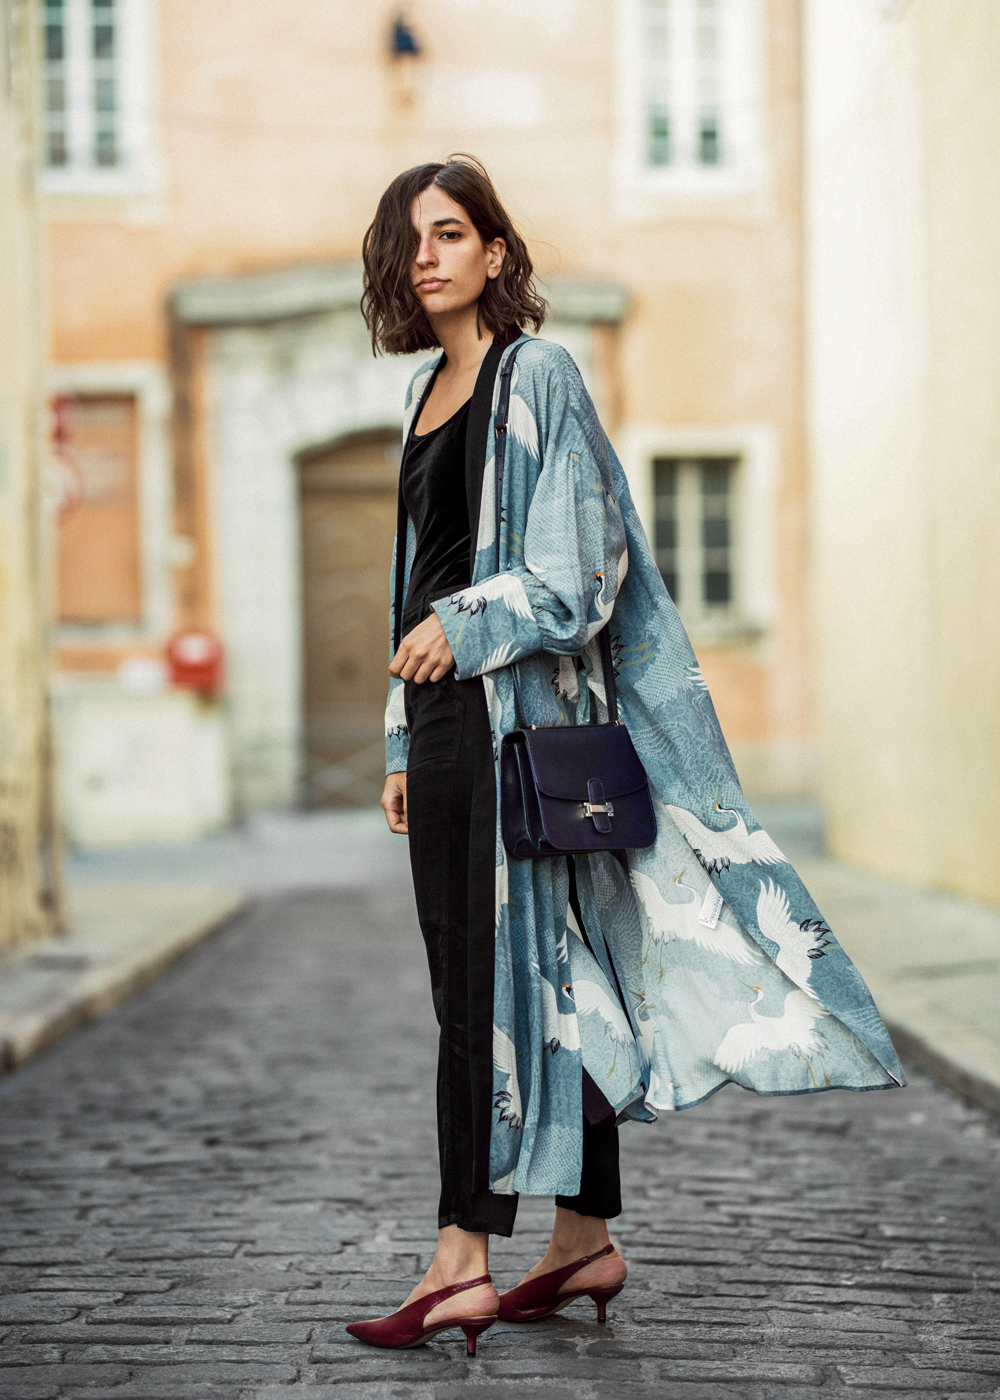 26b8c1de dress-kimono-inspired-robe-heron-printed-zara -new-collection-aria-di-bari-kitten-heels-silk-pants-velvet-bodysuit-french-blogger